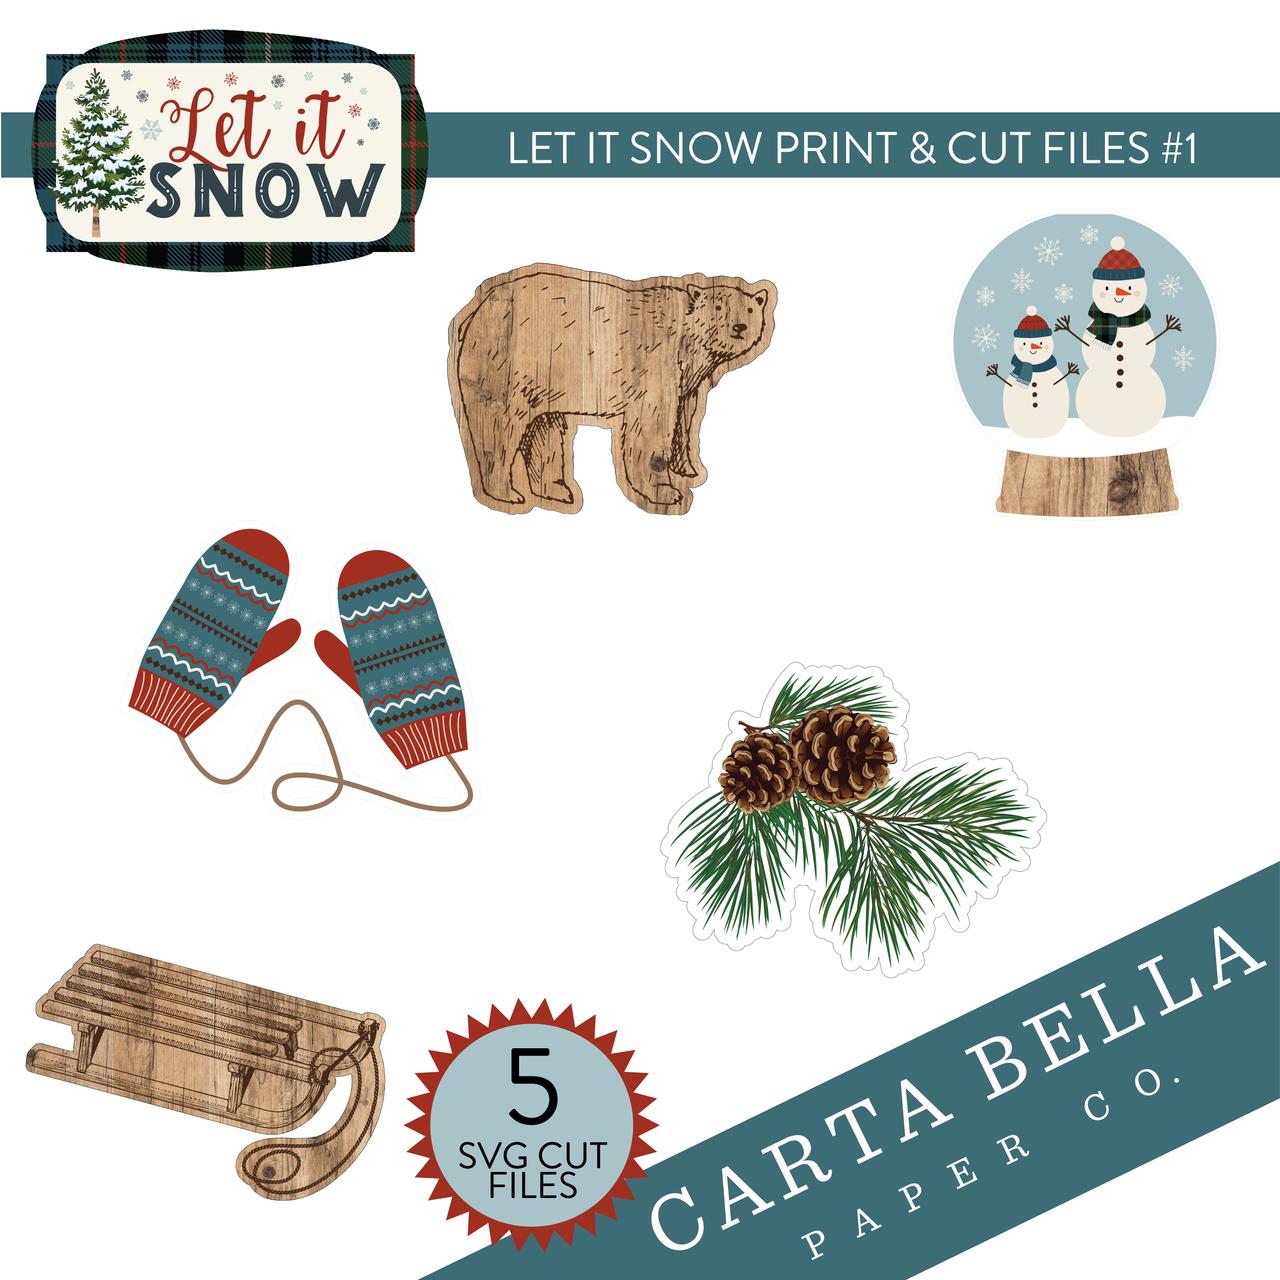 Let It Snow Print & Cut Files #1